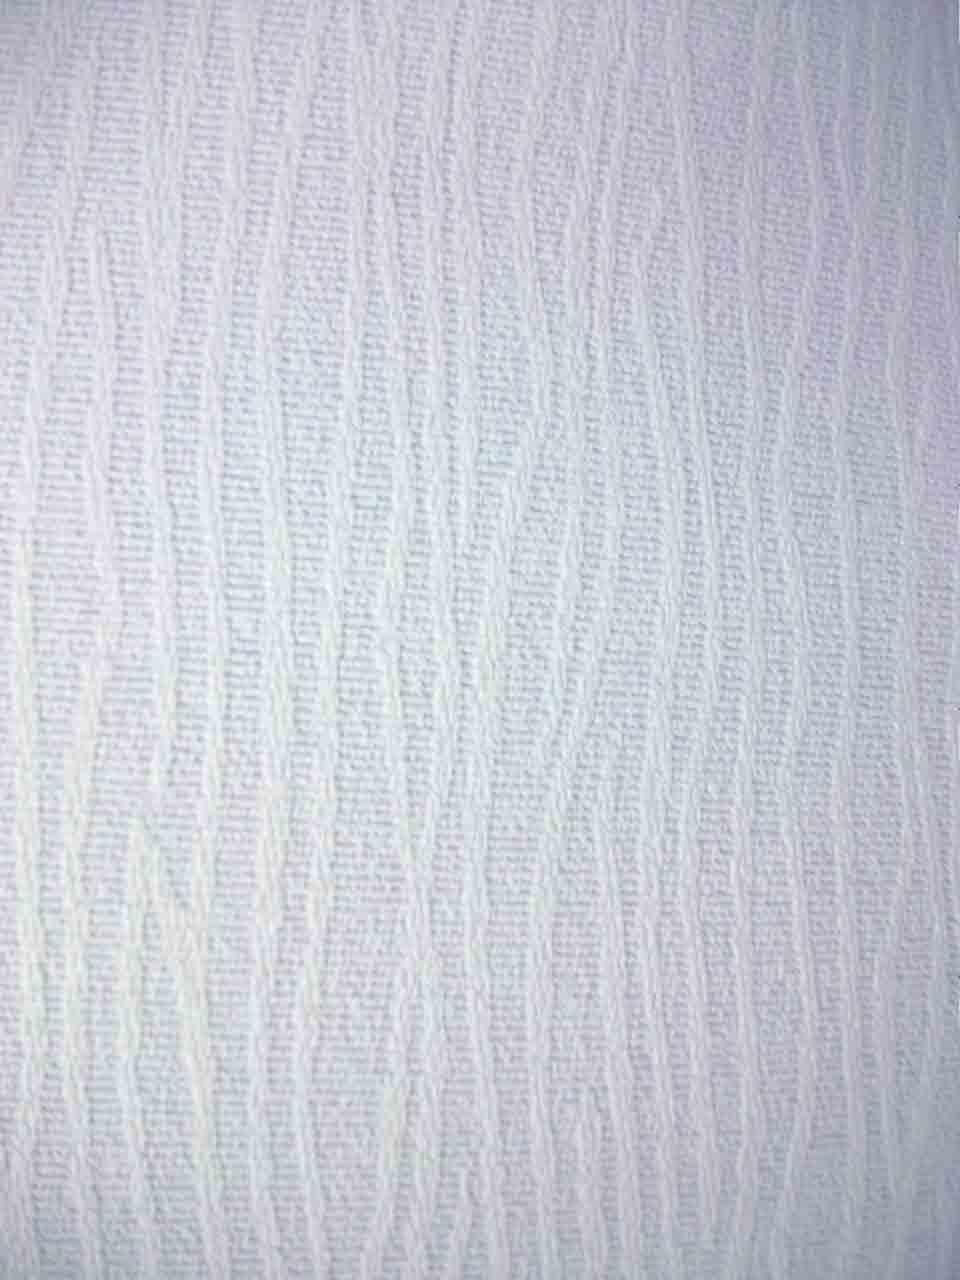 Creslan Paintable Knit Paintable Wallpaper Paintable Wallpaper